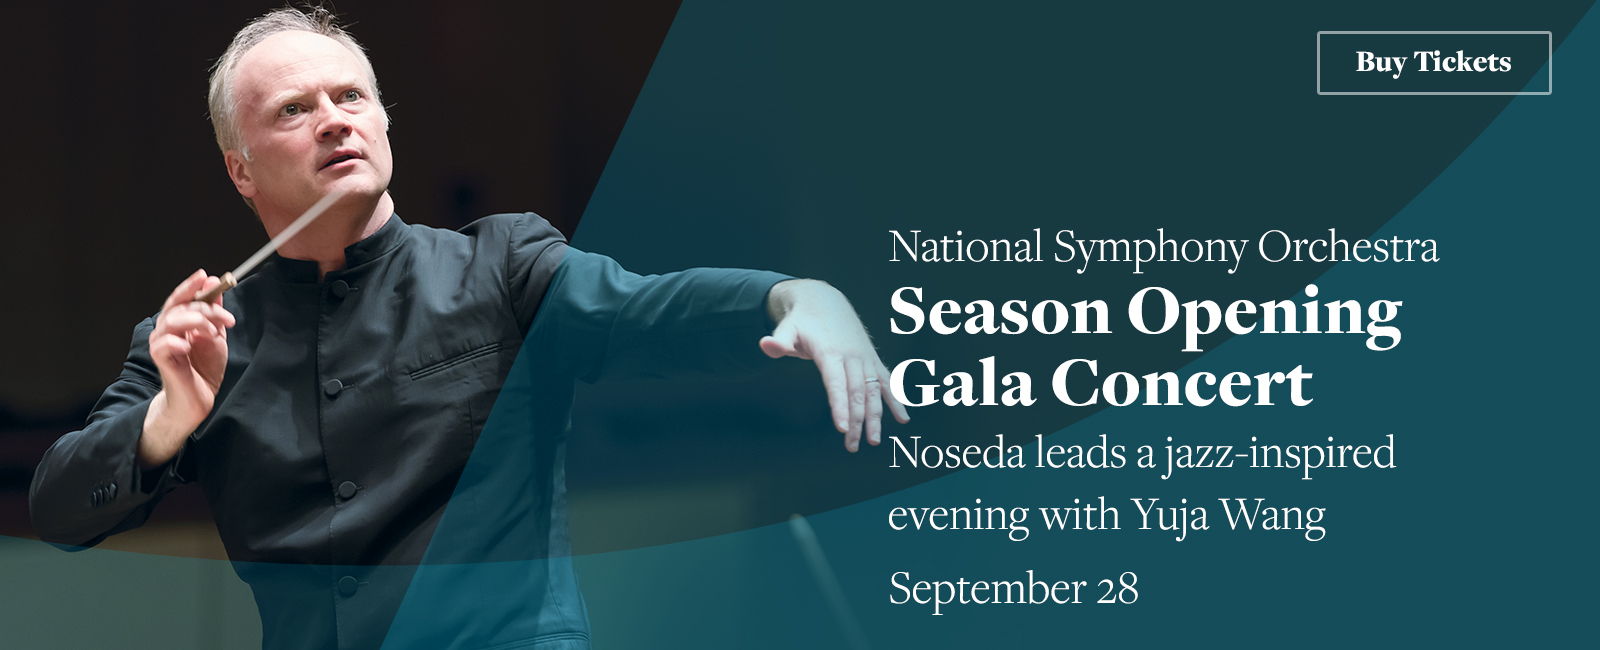 Season Opening Gala Concert